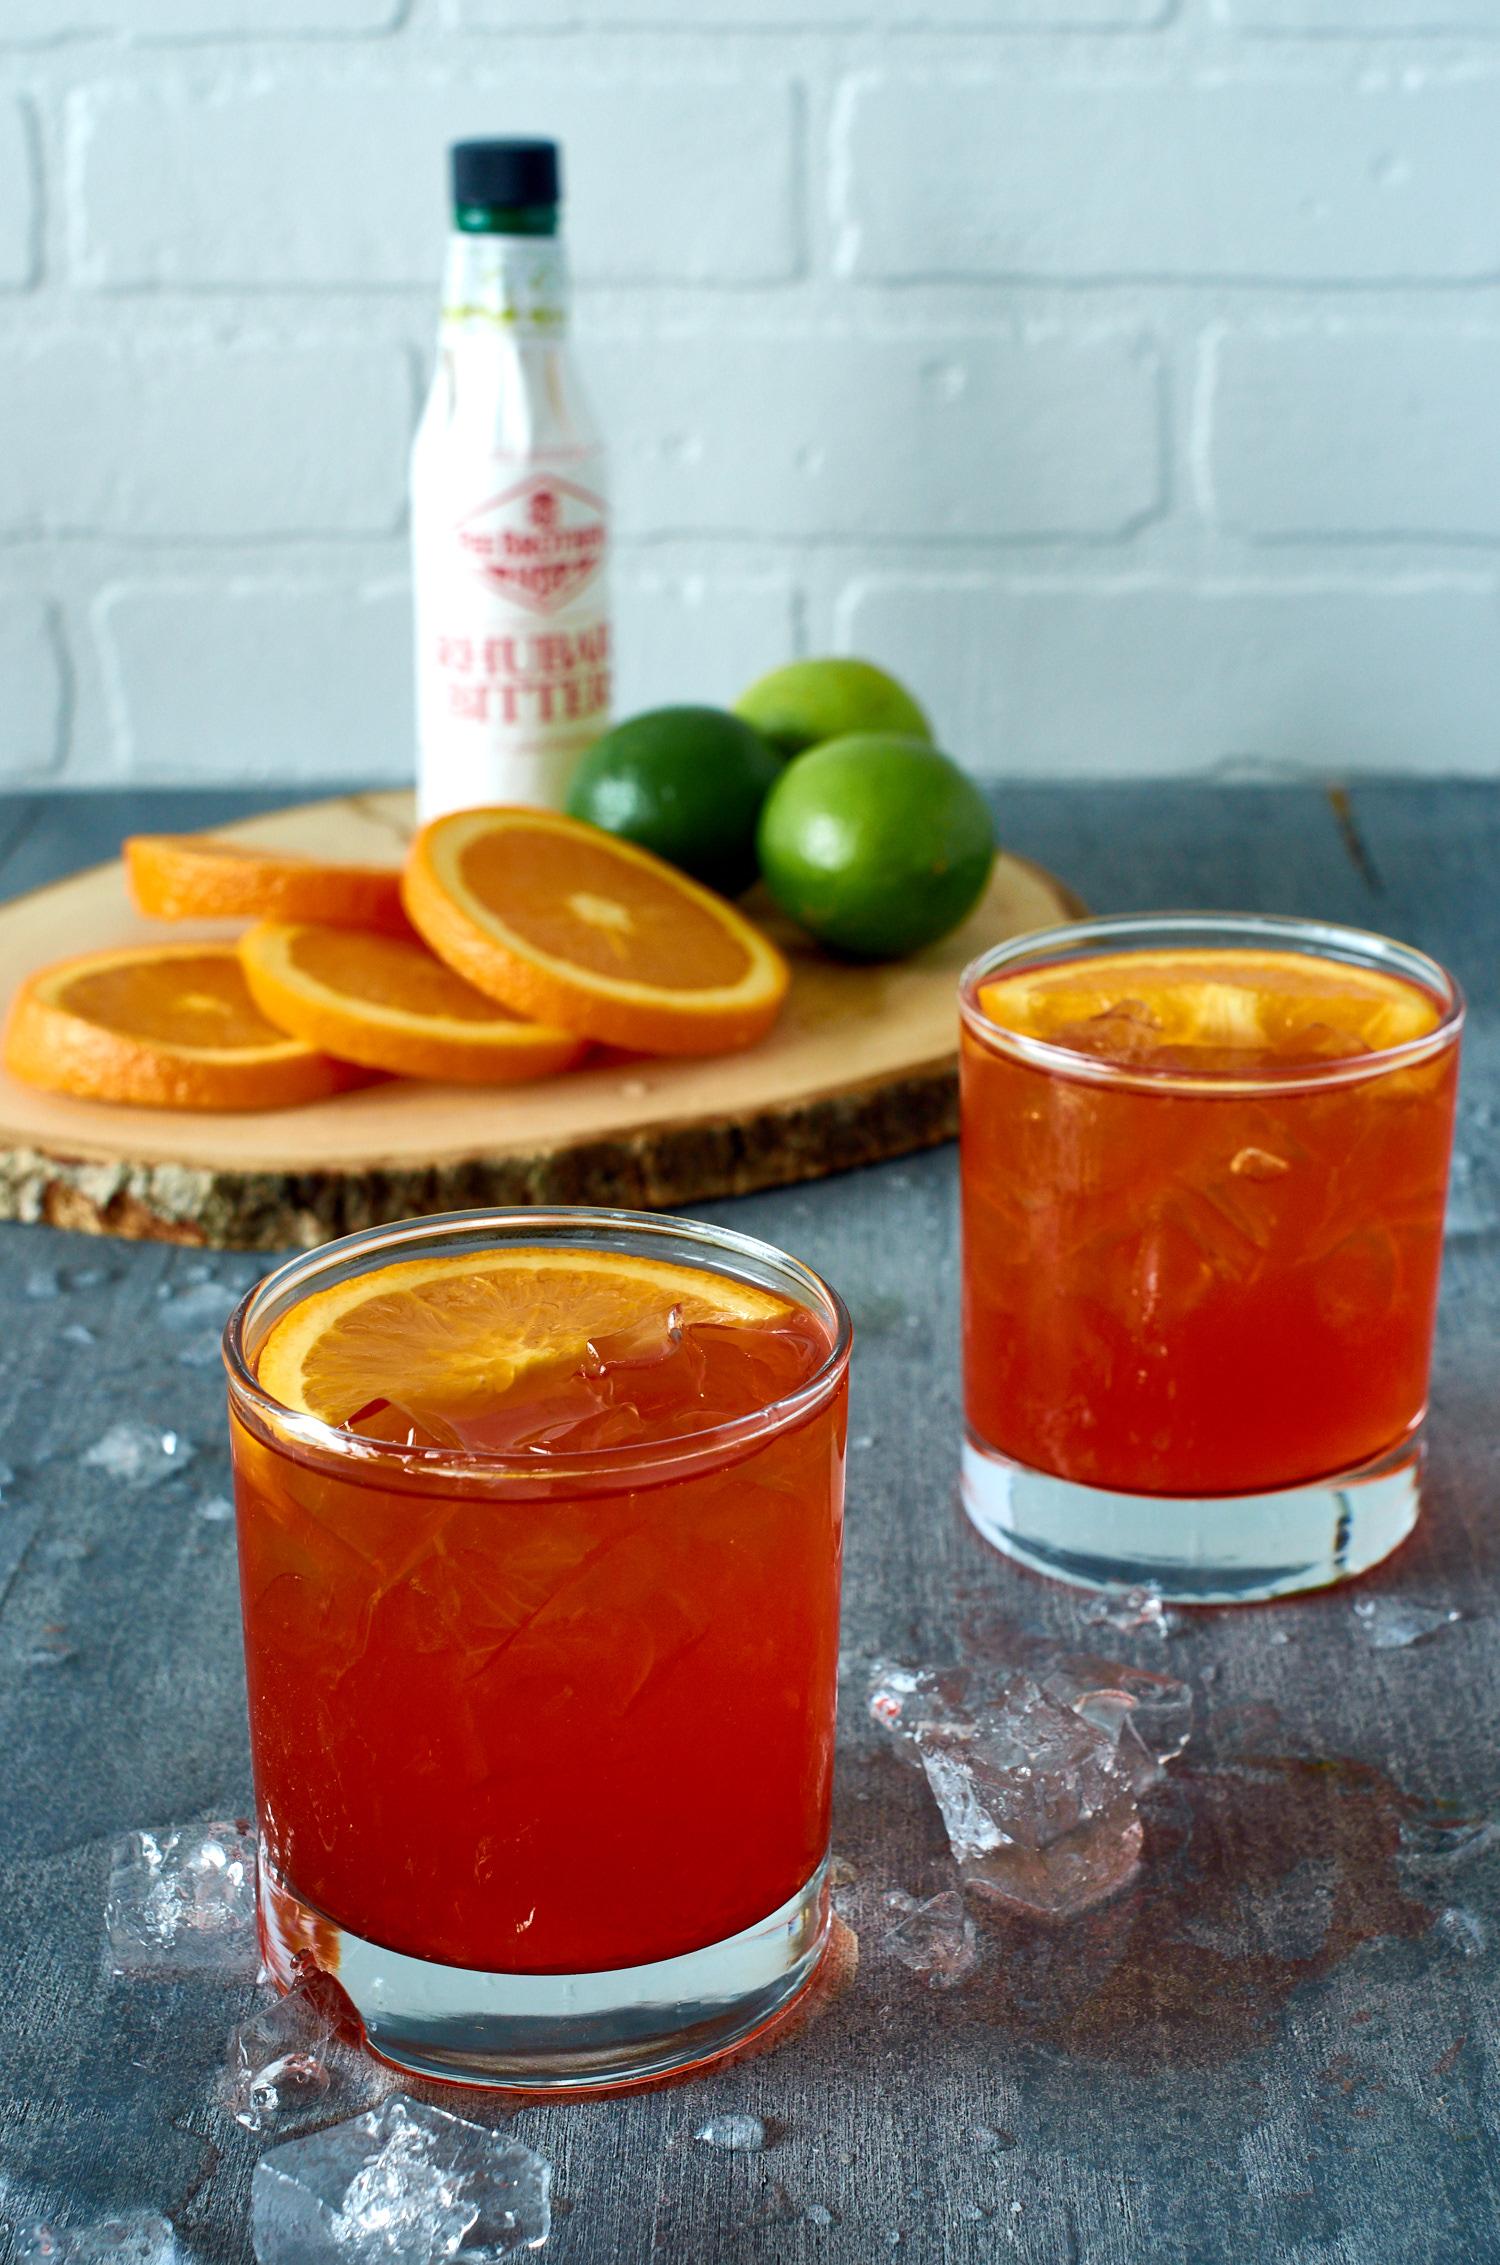 Kanga Rhu - Tequila cocktail